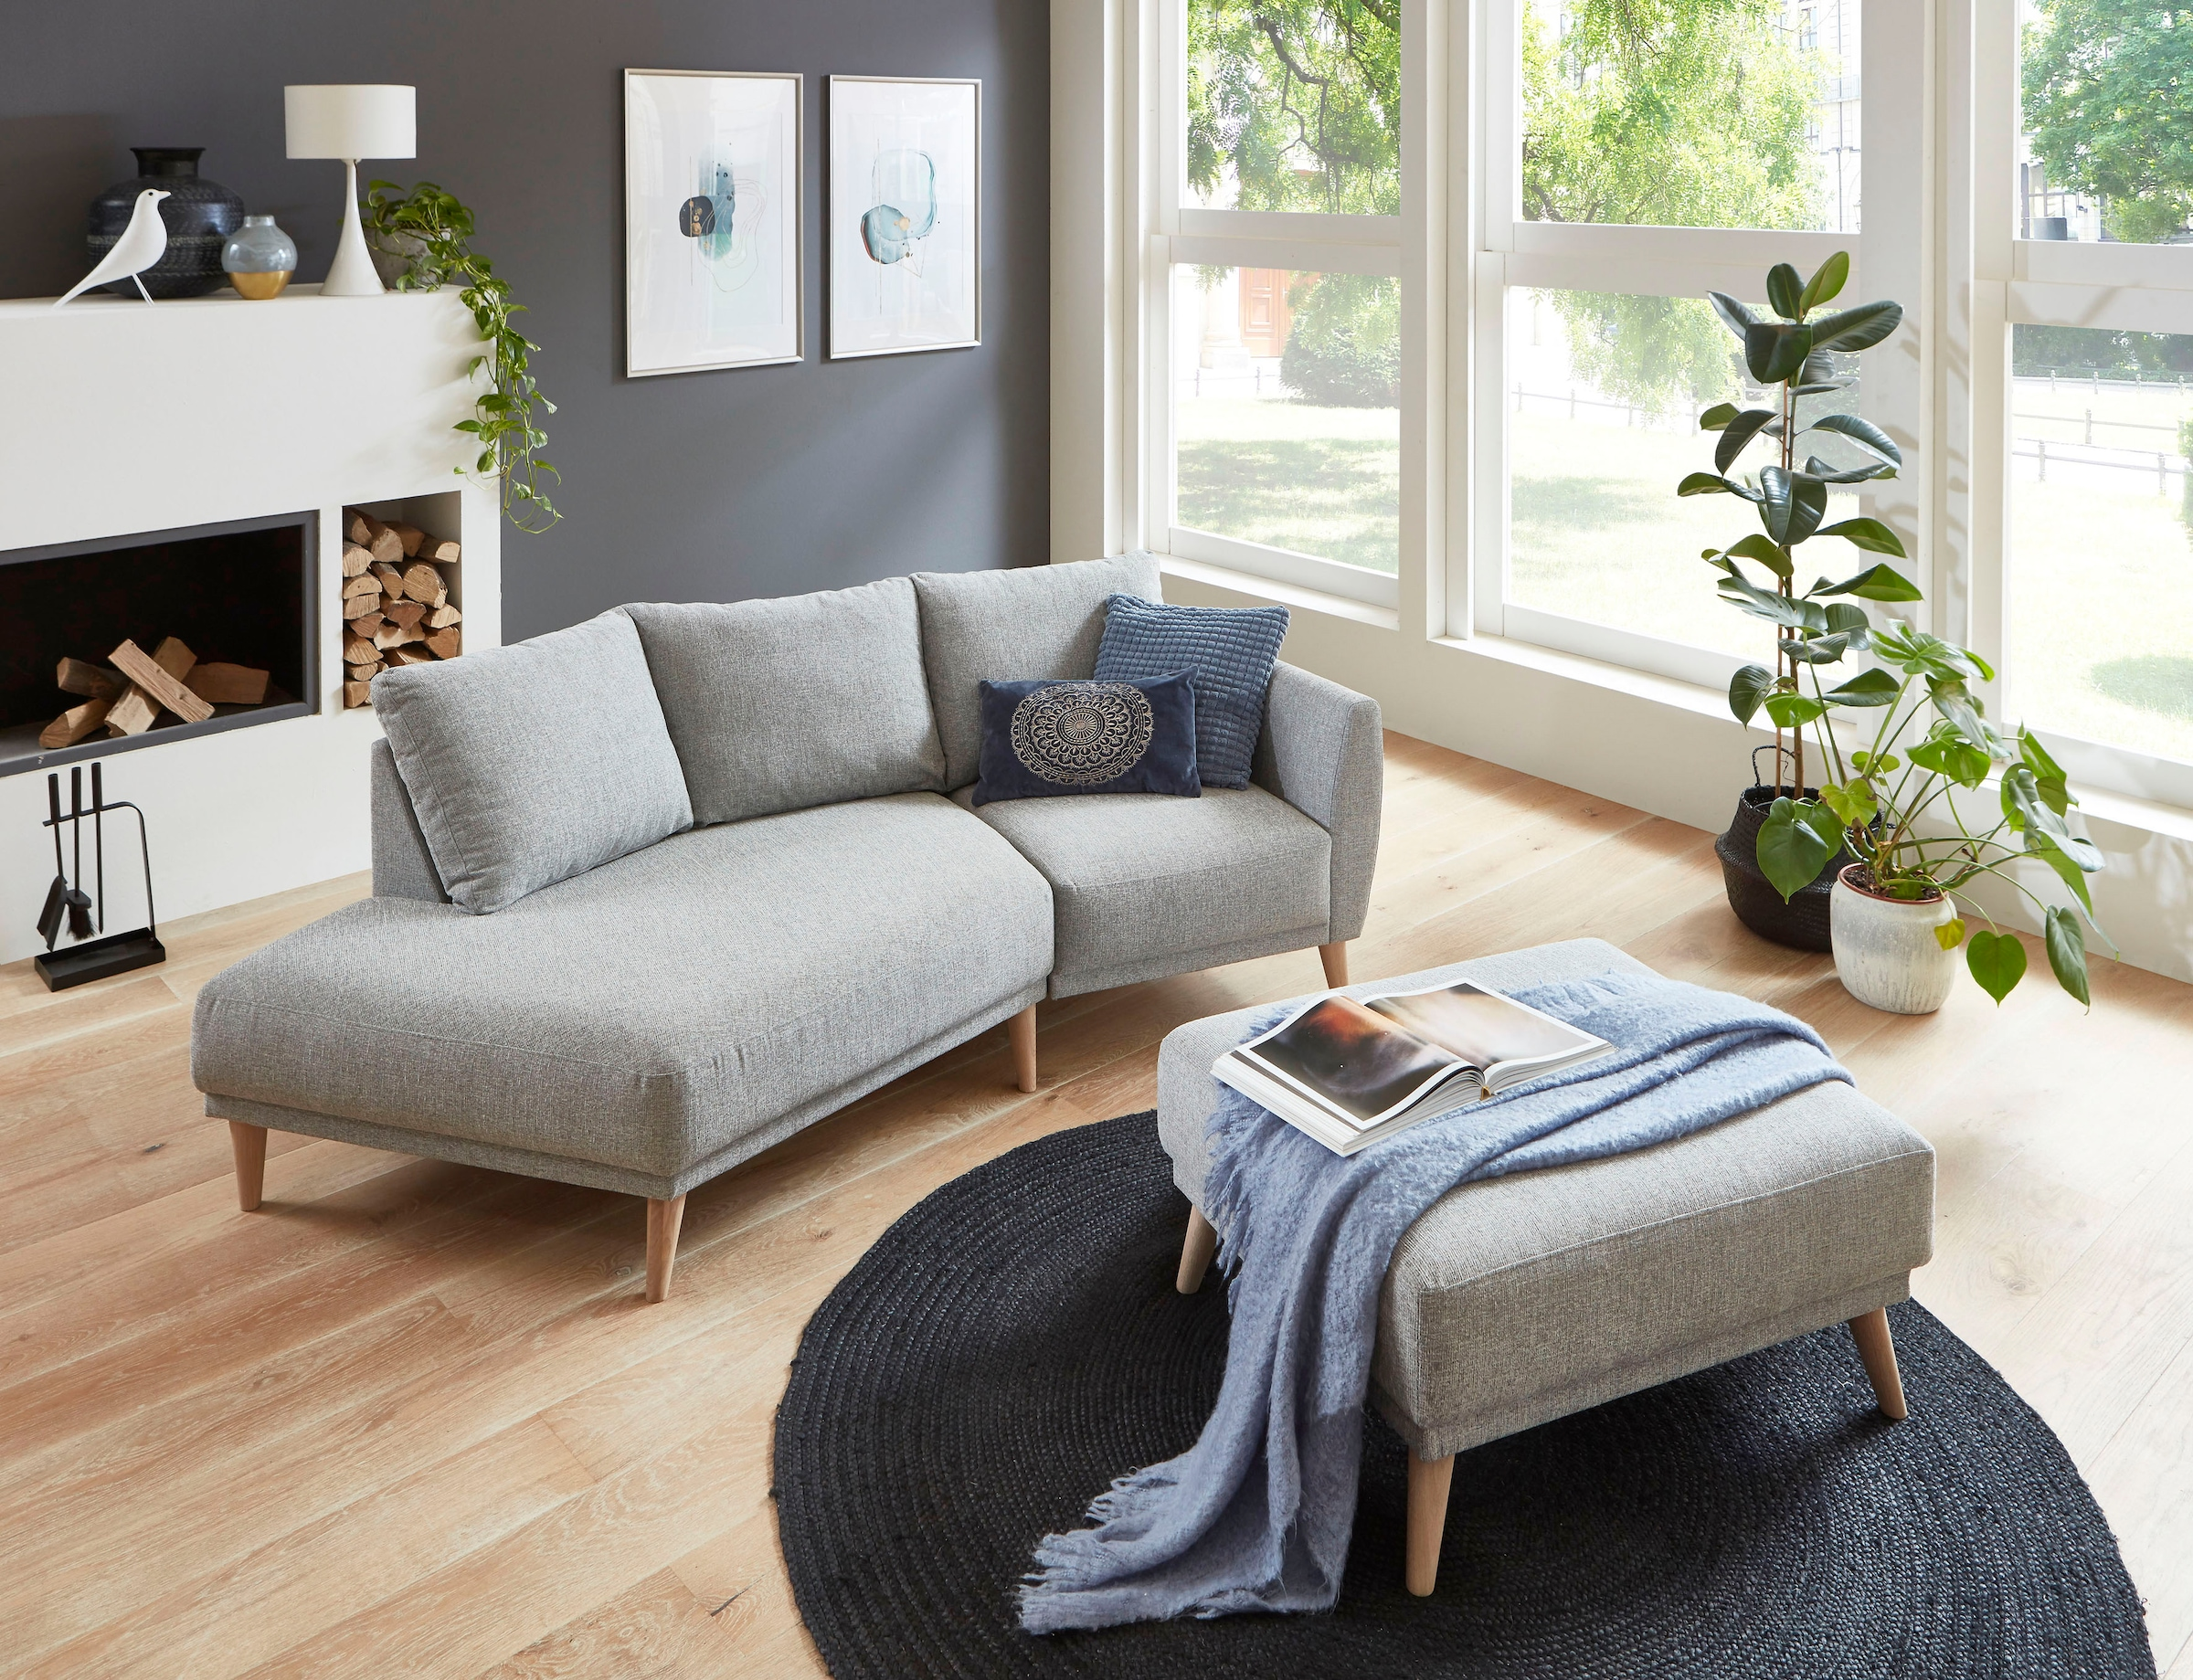 Image of ATLANTIC home collection 2,5-Sitzer »Elvis«, Polsterecke mit offenem Ende im skandinavischen Stil